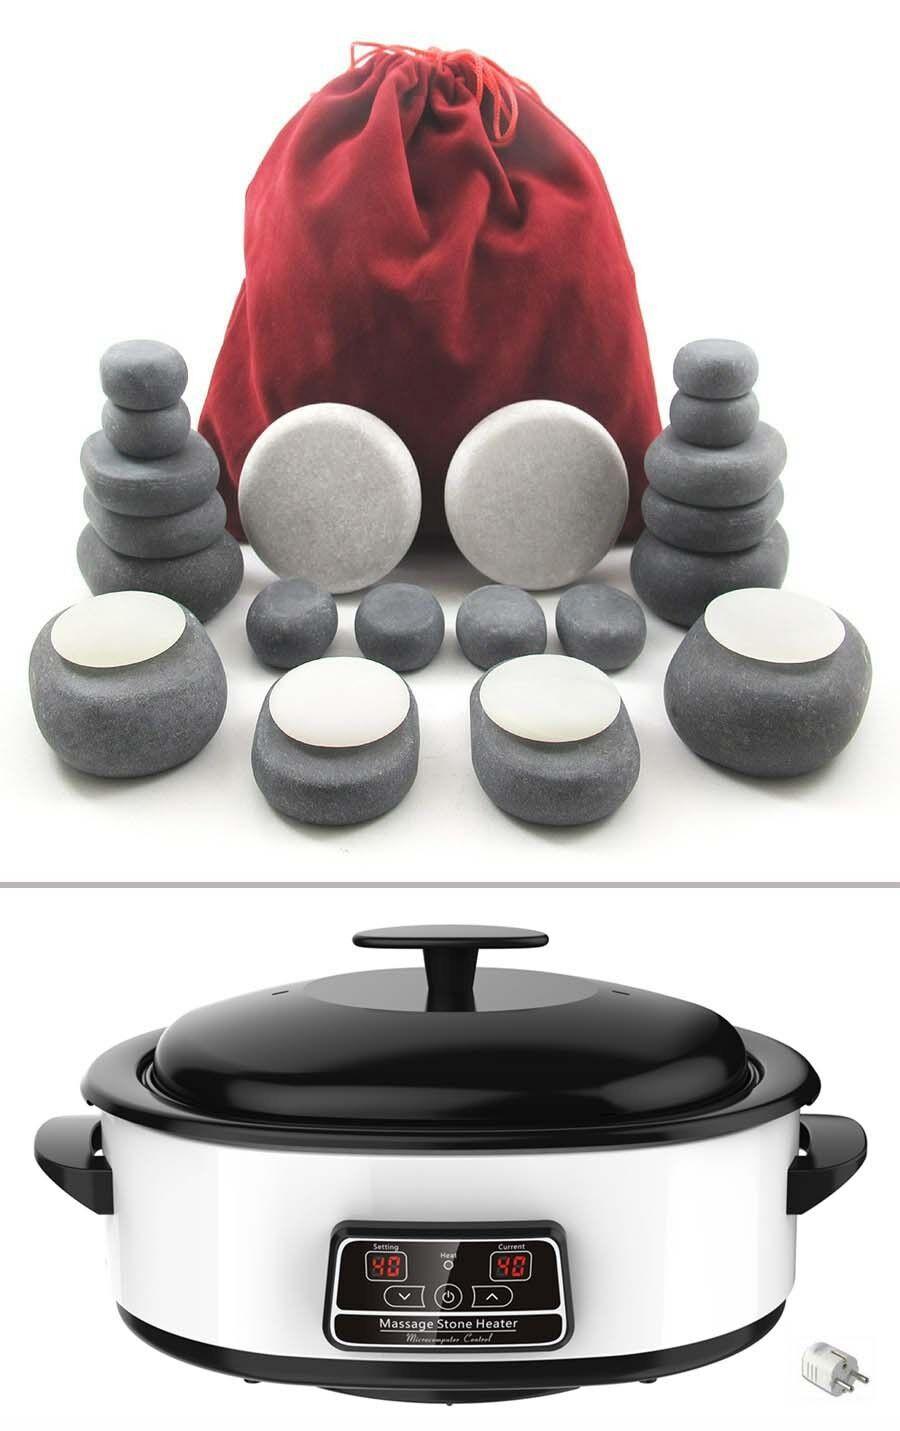 Hot Stone Massage Kit 24 Basalt & Marmorsteine +  Wärmegerät 6 Liter